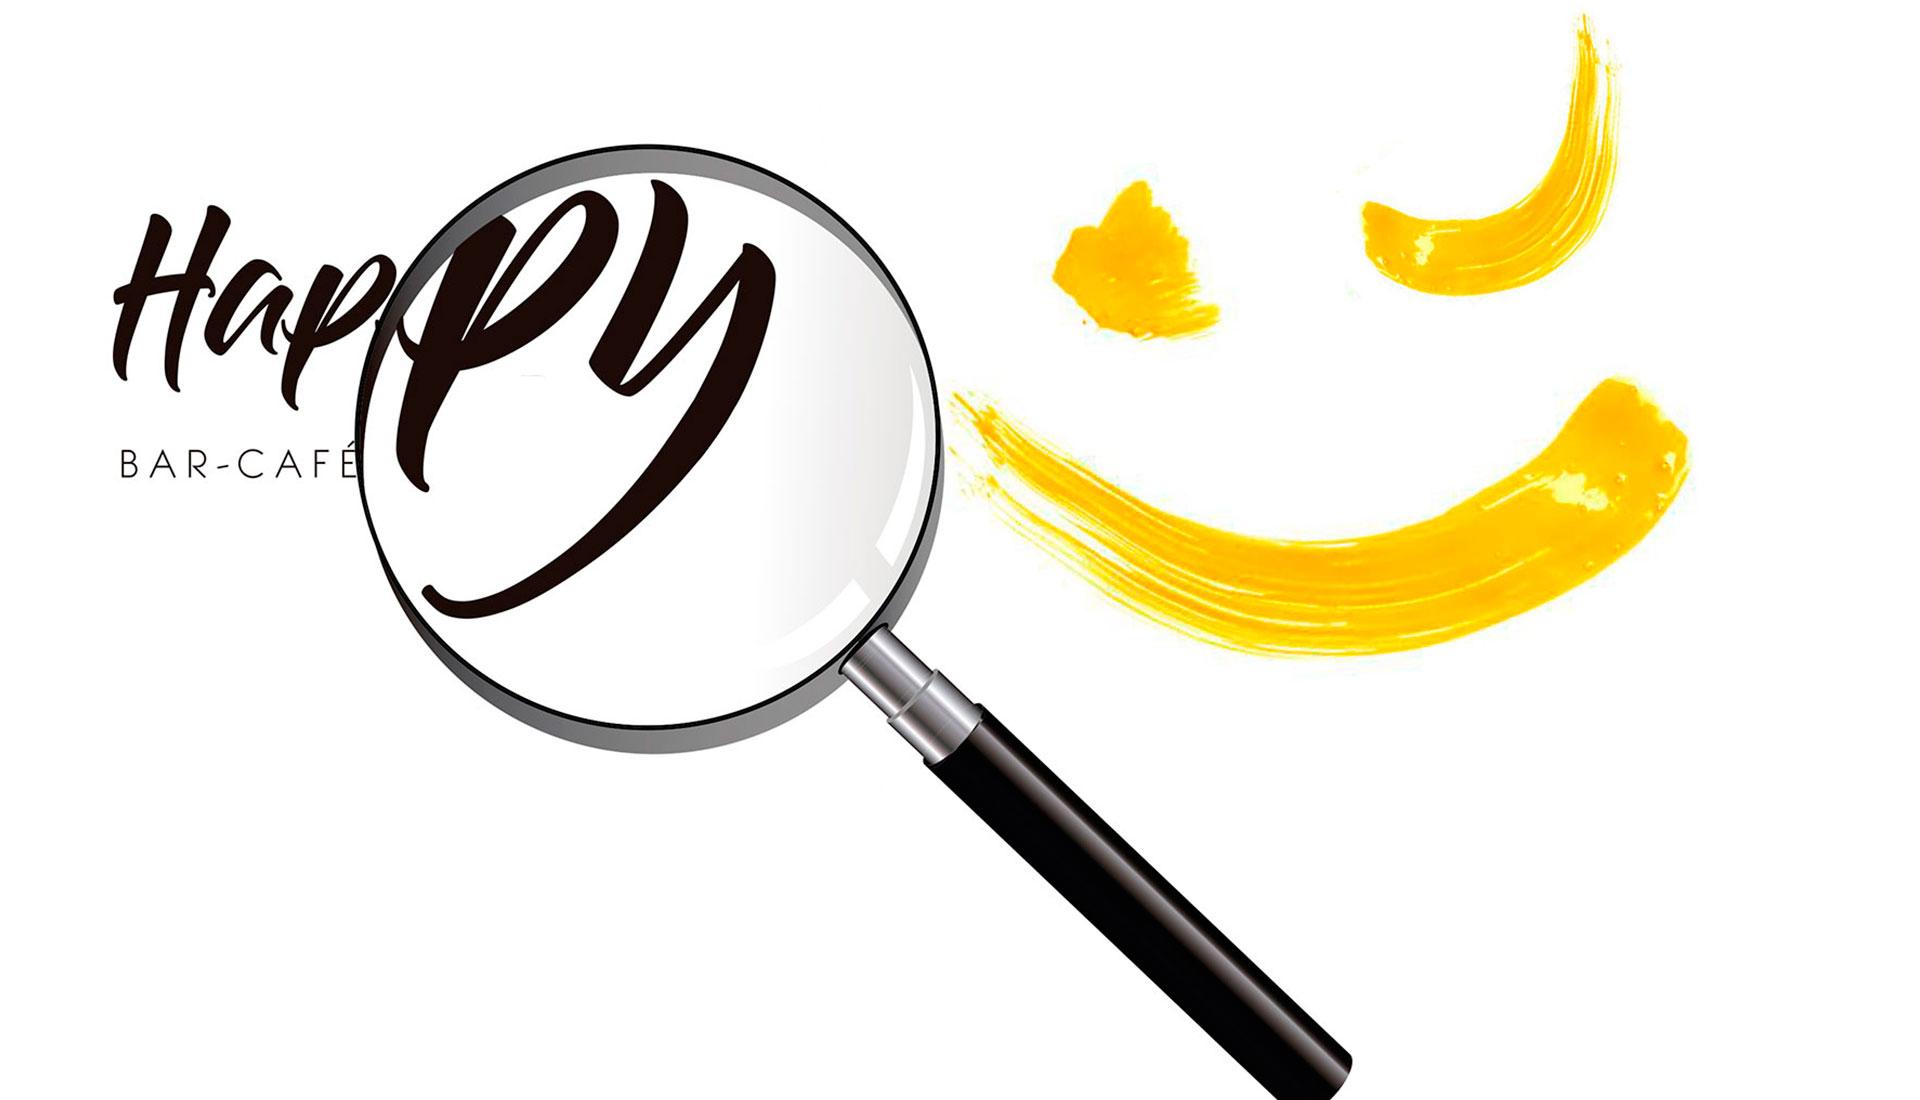 agencia-pennyworth-marketing-digital-identidad-corporativa-branding-restaurante-valencia-03